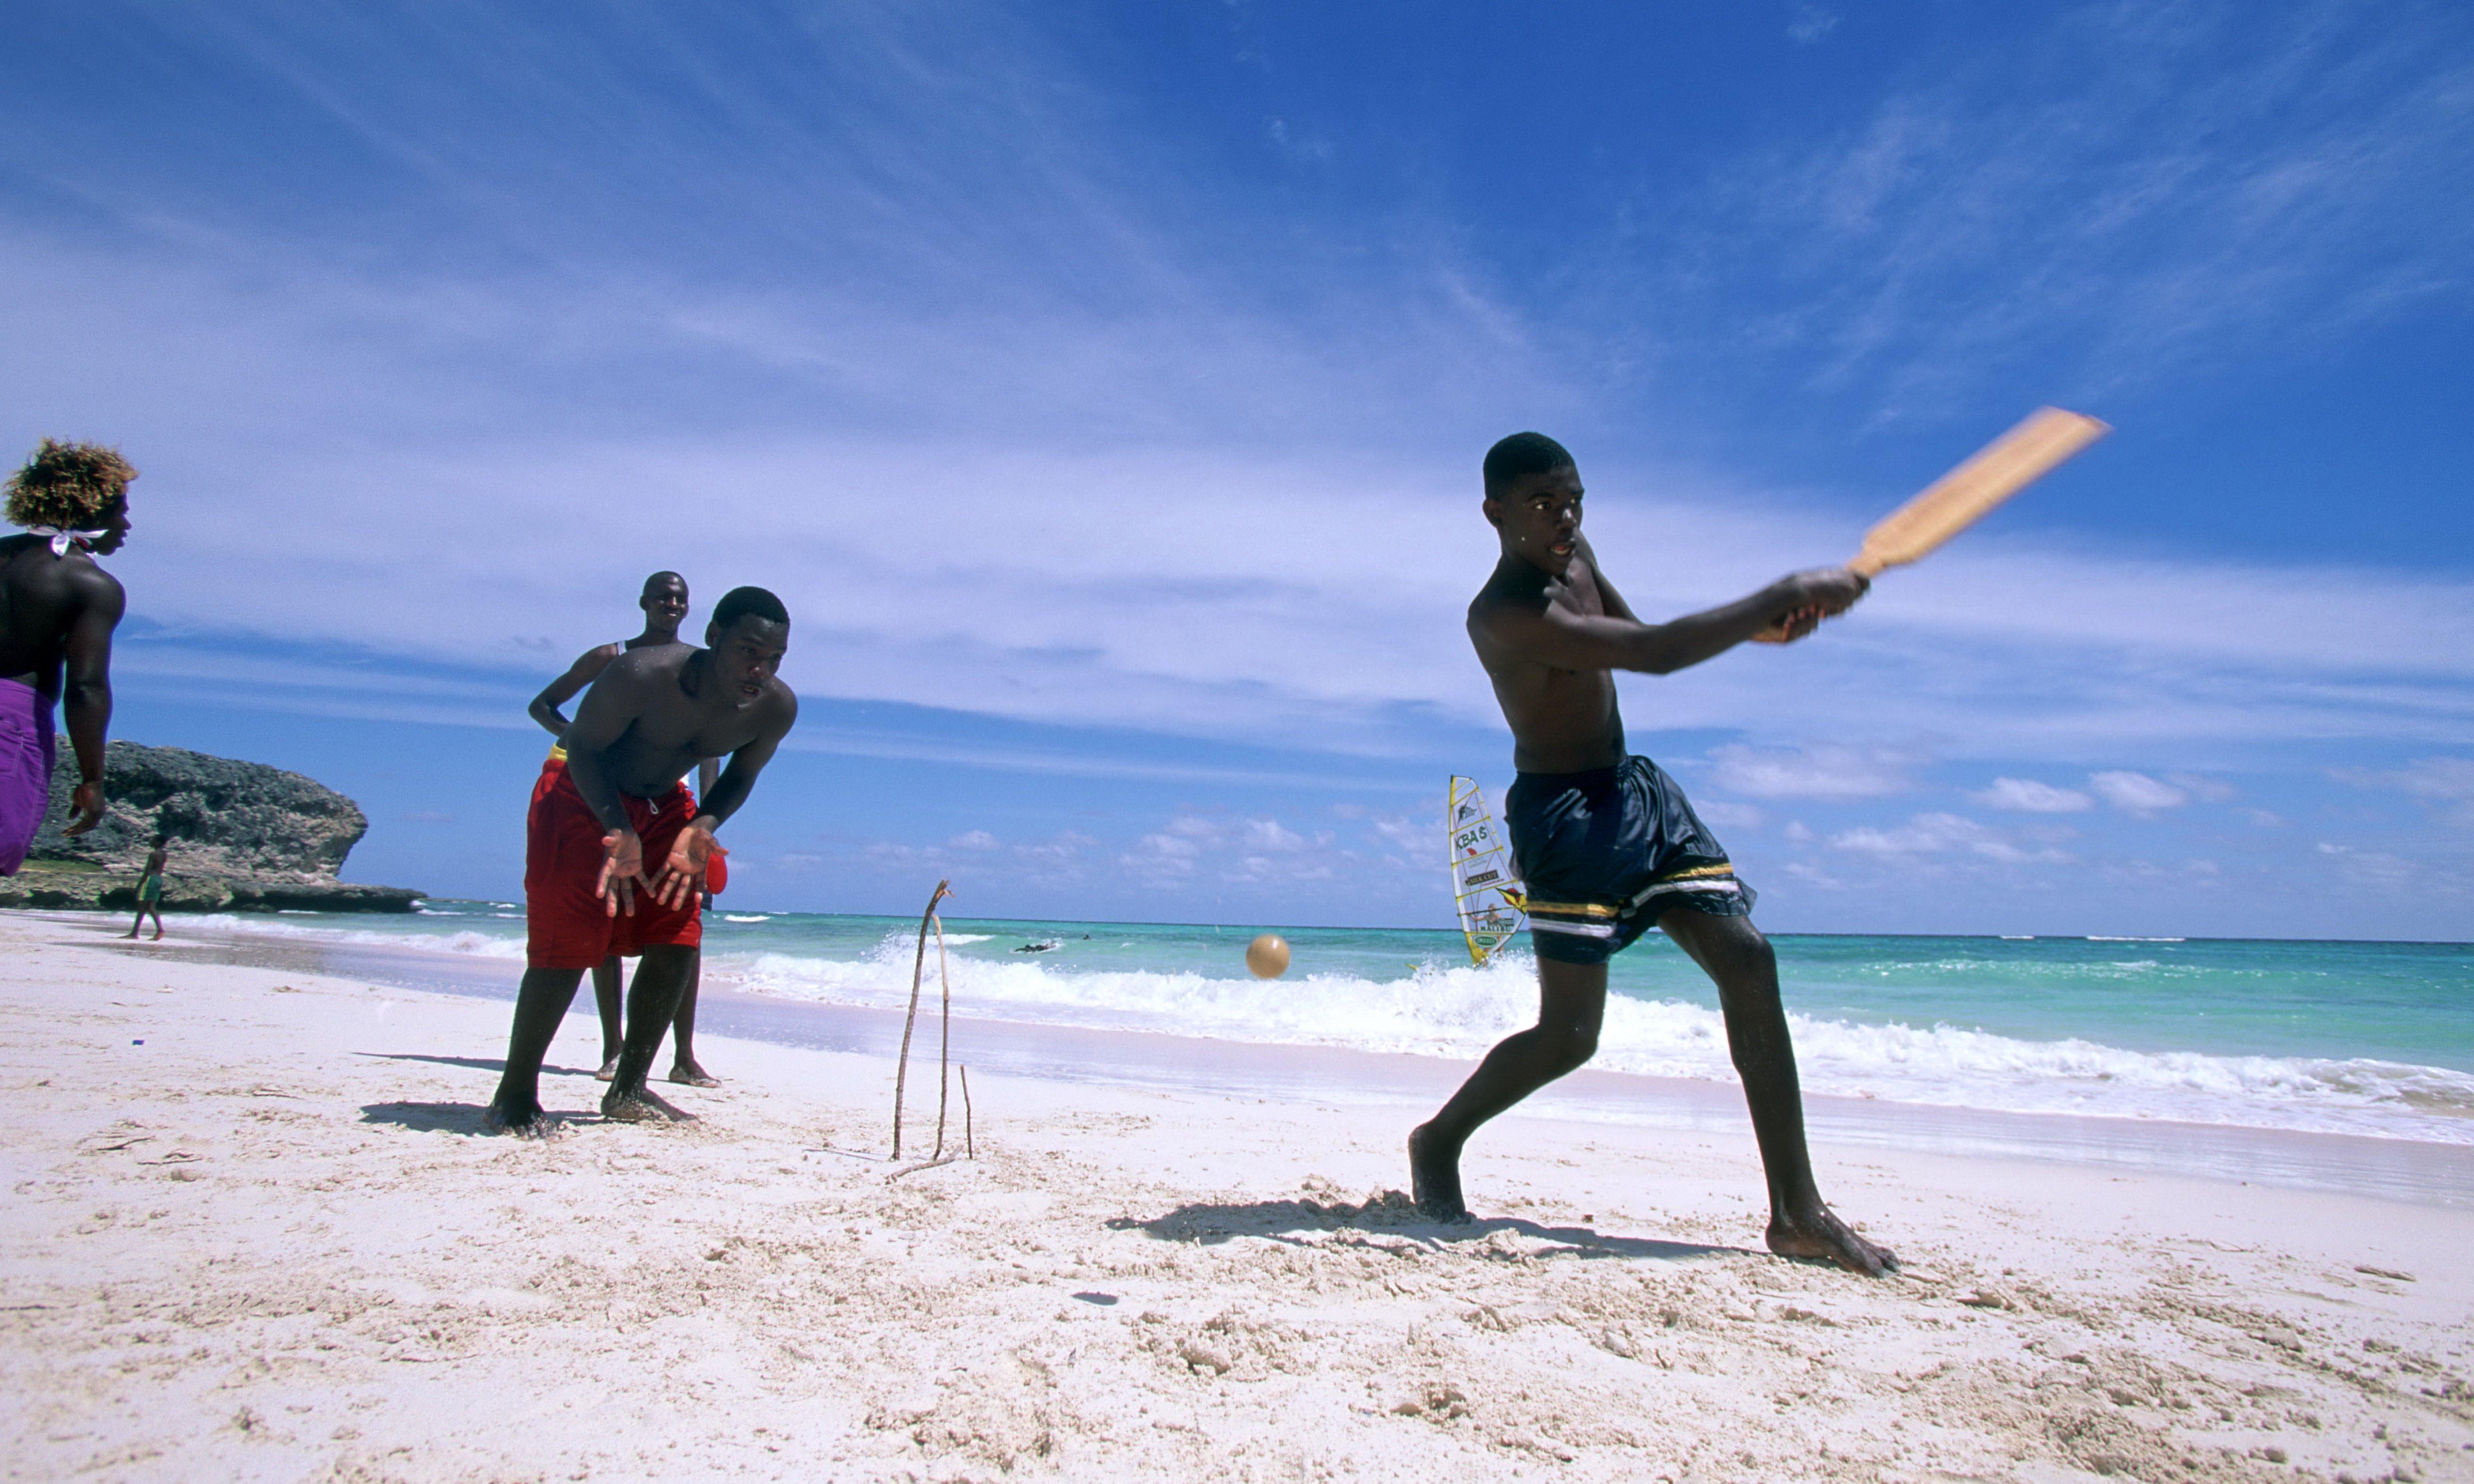 Barbados didn't feel like black man country – till I saw boys walking freely